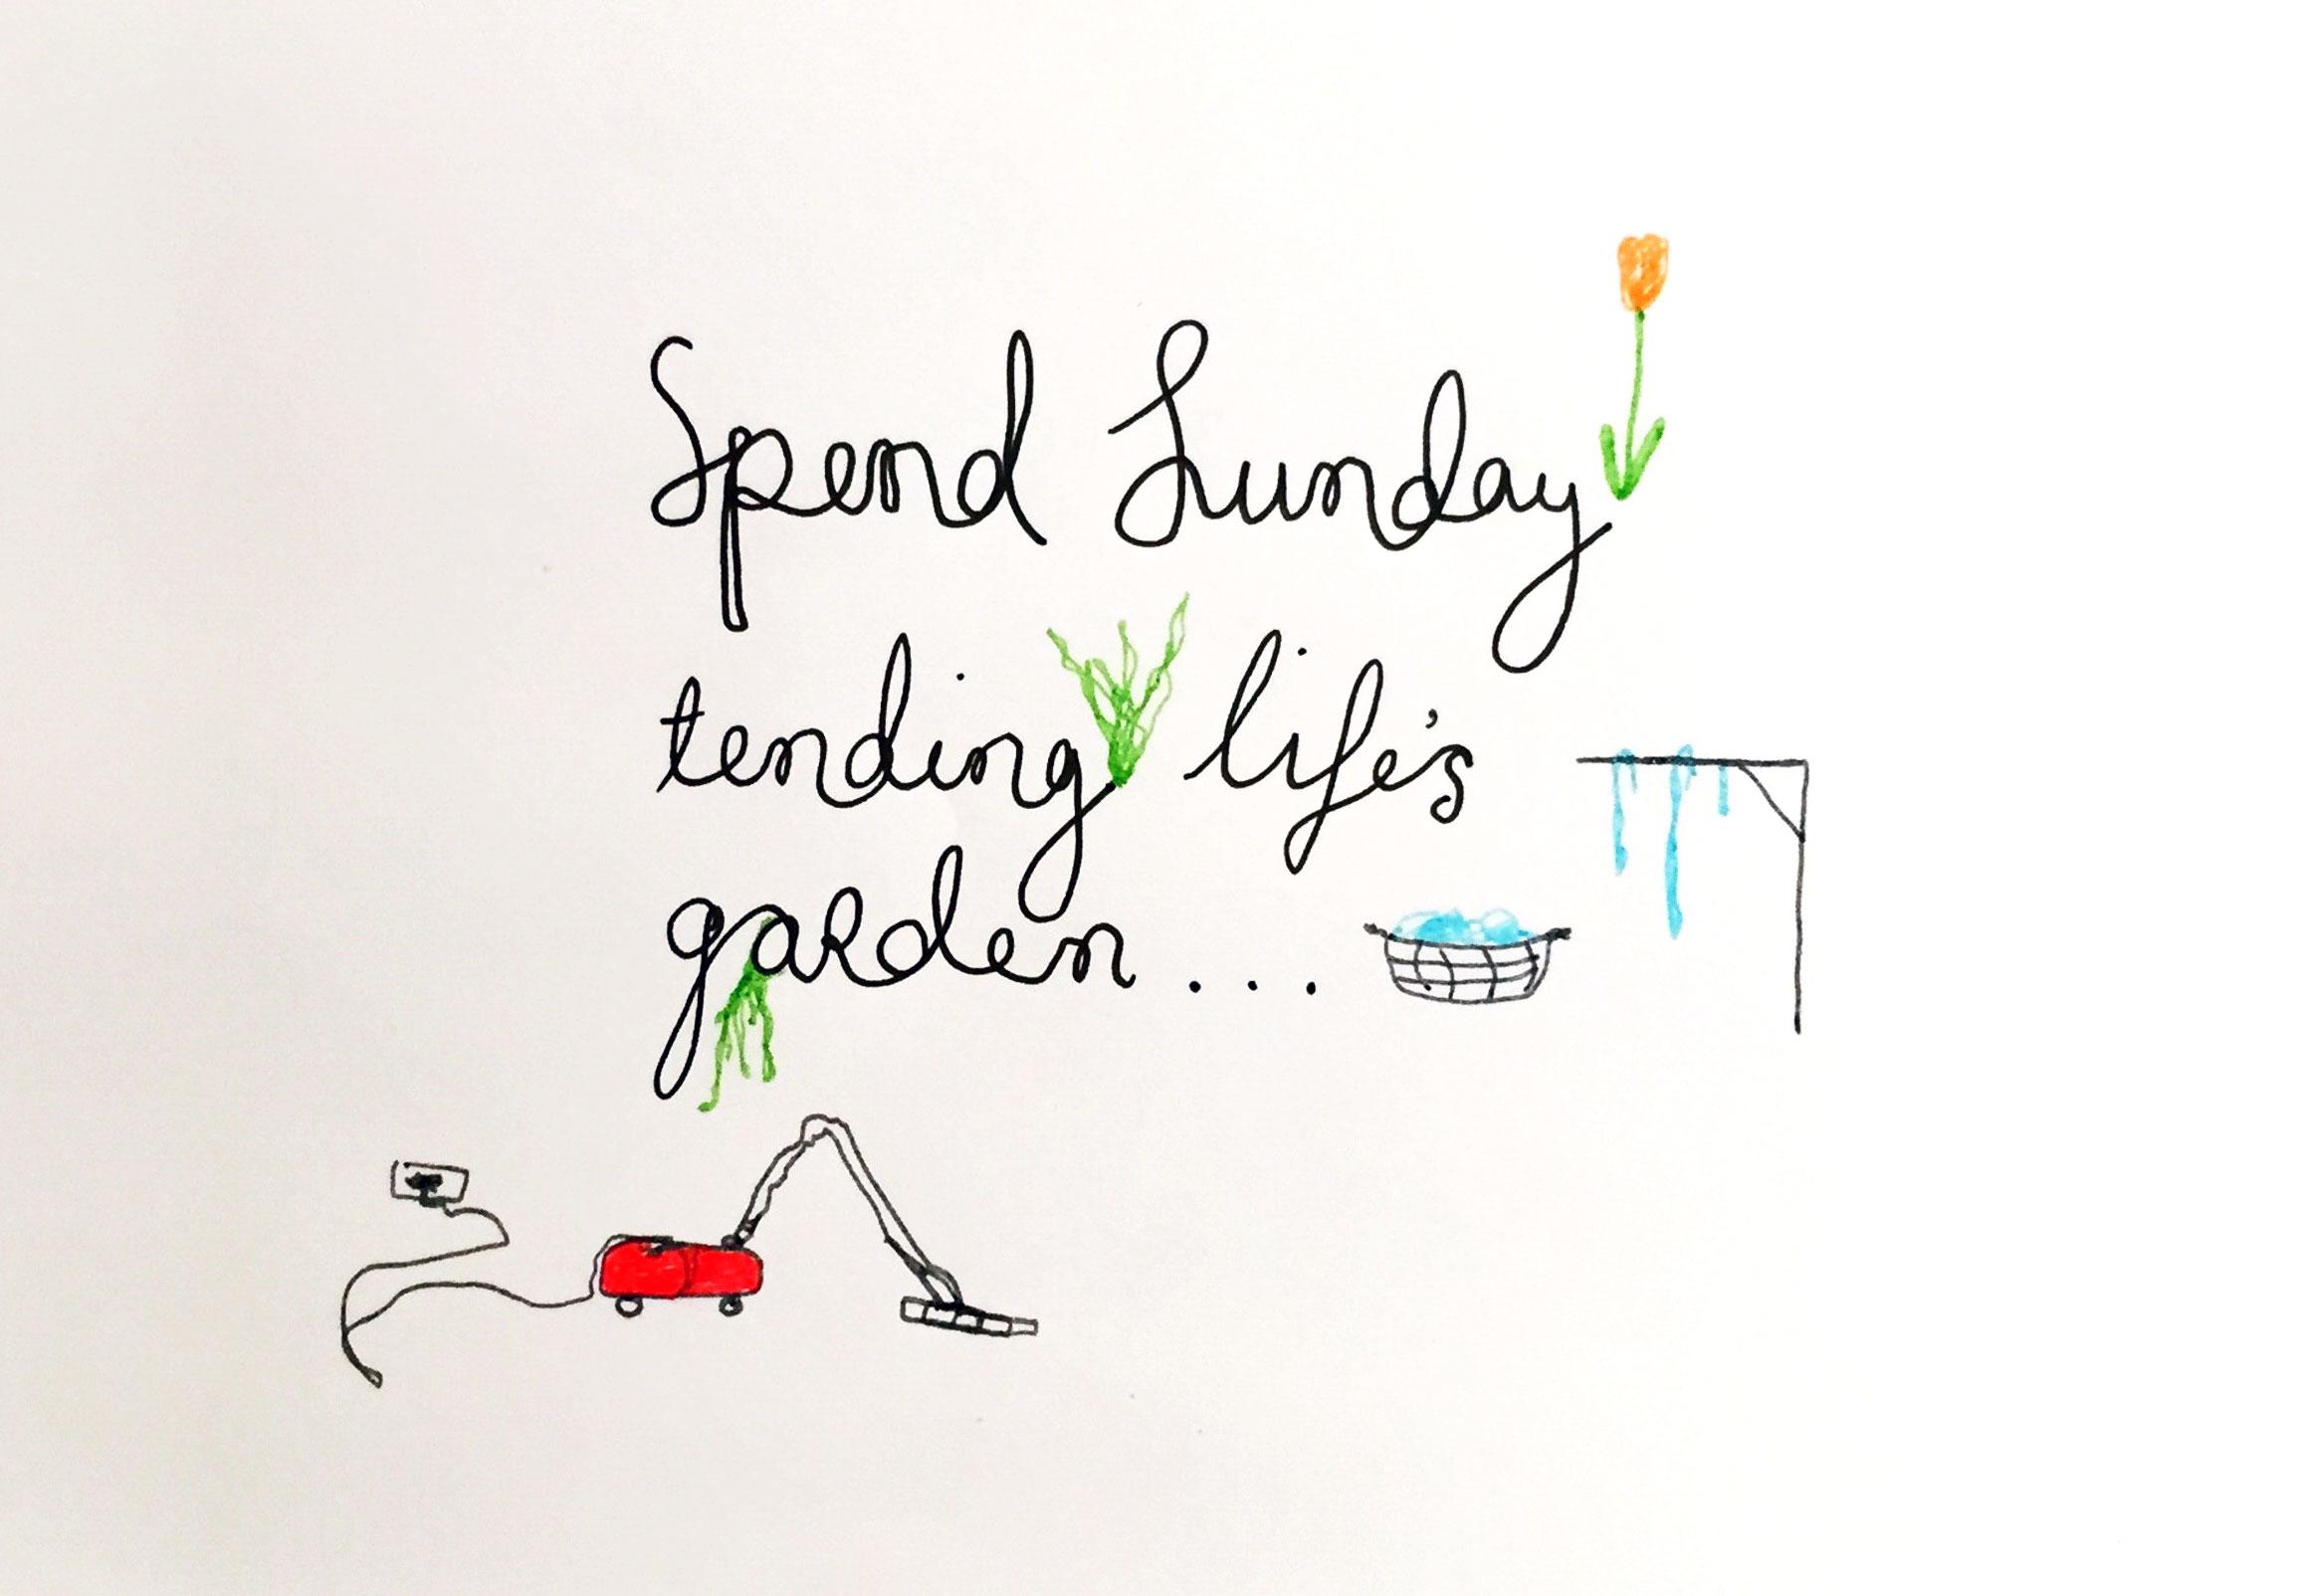 Tending life's garden. Drawing Luke Hockley.